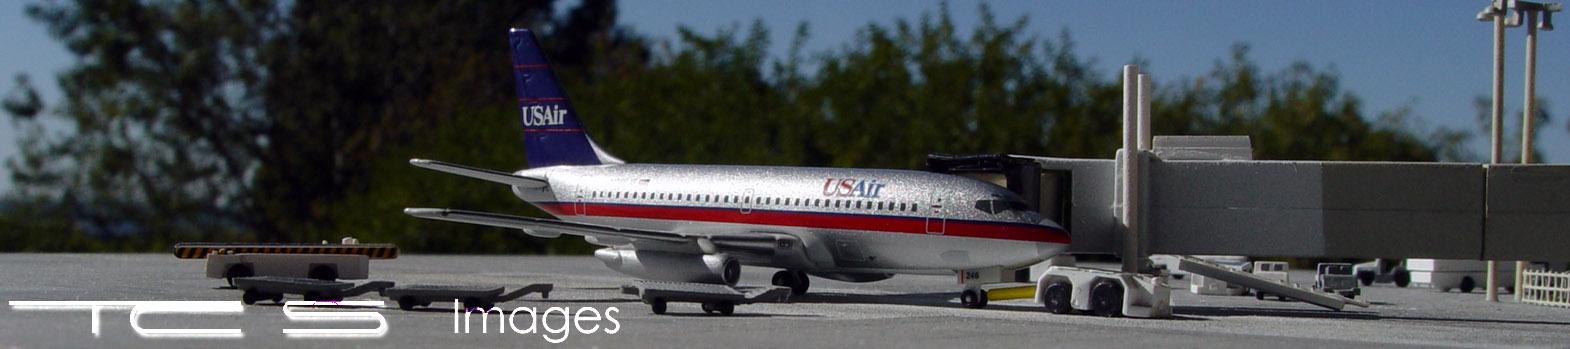 U.S. Air 737-200